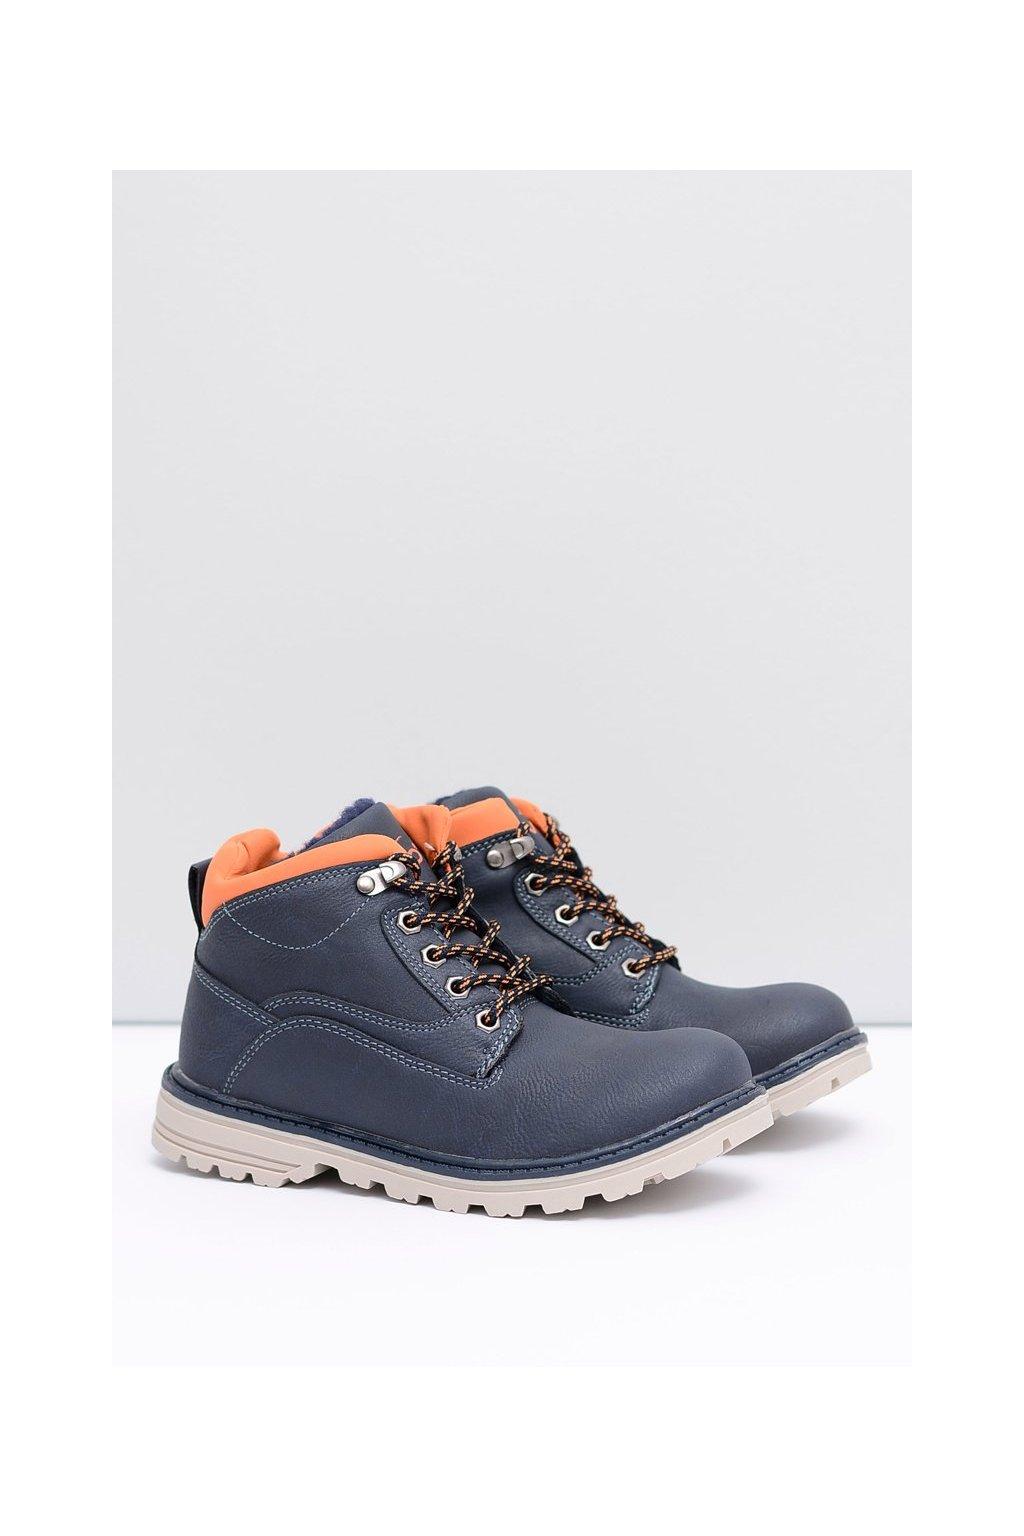 Detské členkové topánky farba modrá kód obuvi VOP16D17-2 NAVY